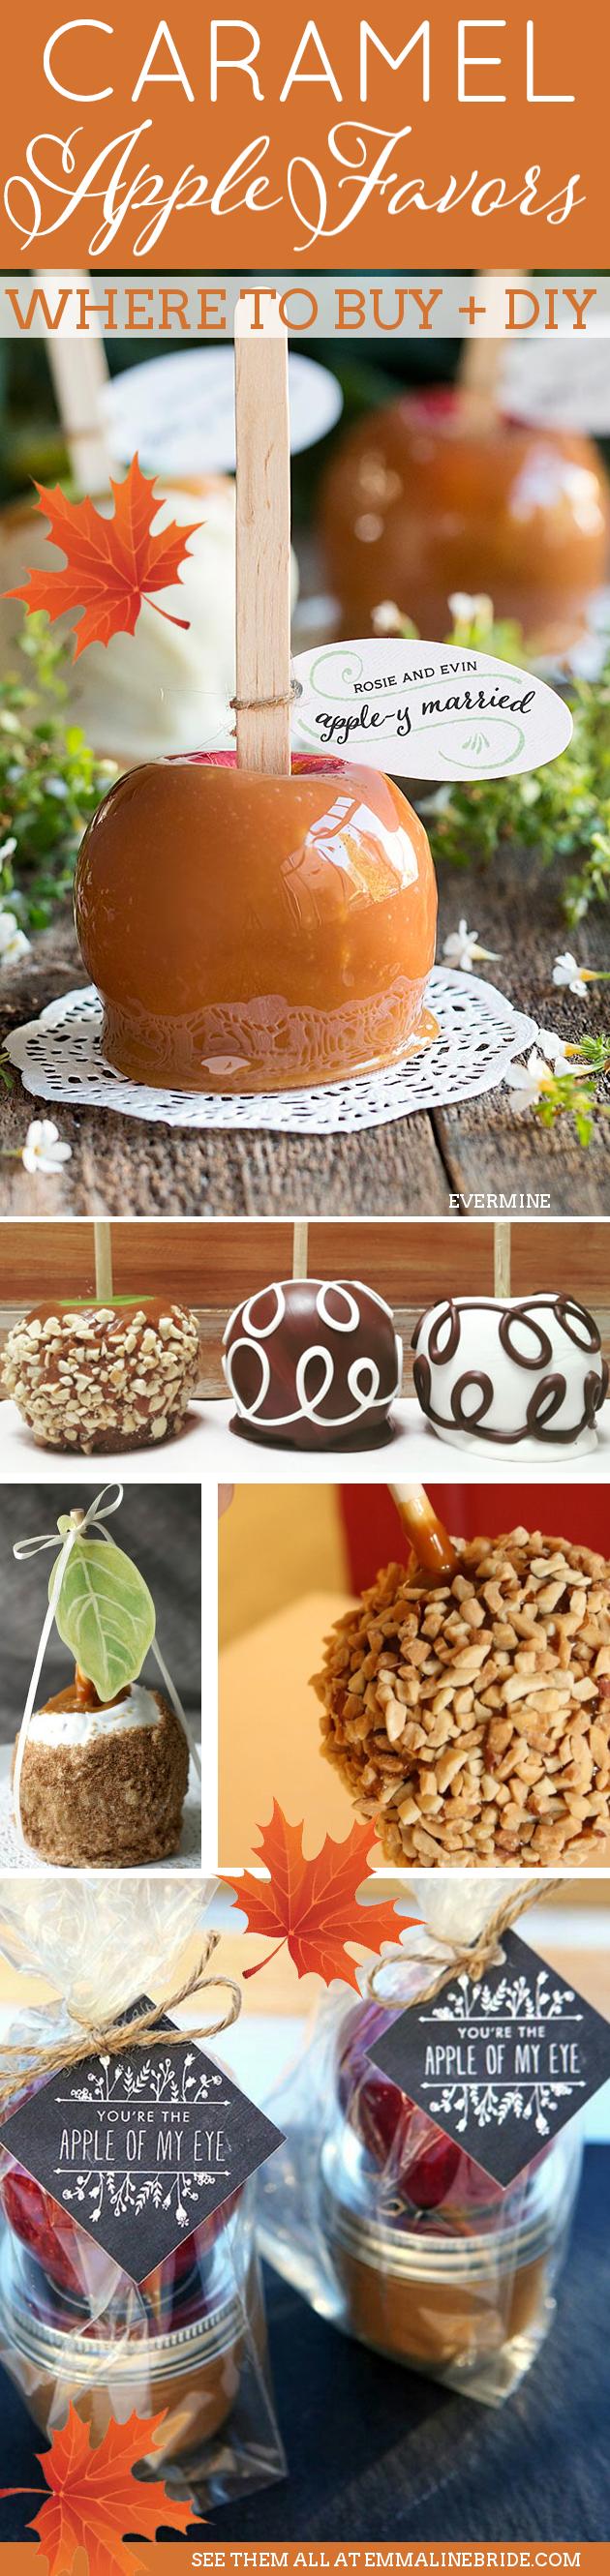 where to buy caramel apple favors for weddings wedding. Black Bedroom Furniture Sets. Home Design Ideas